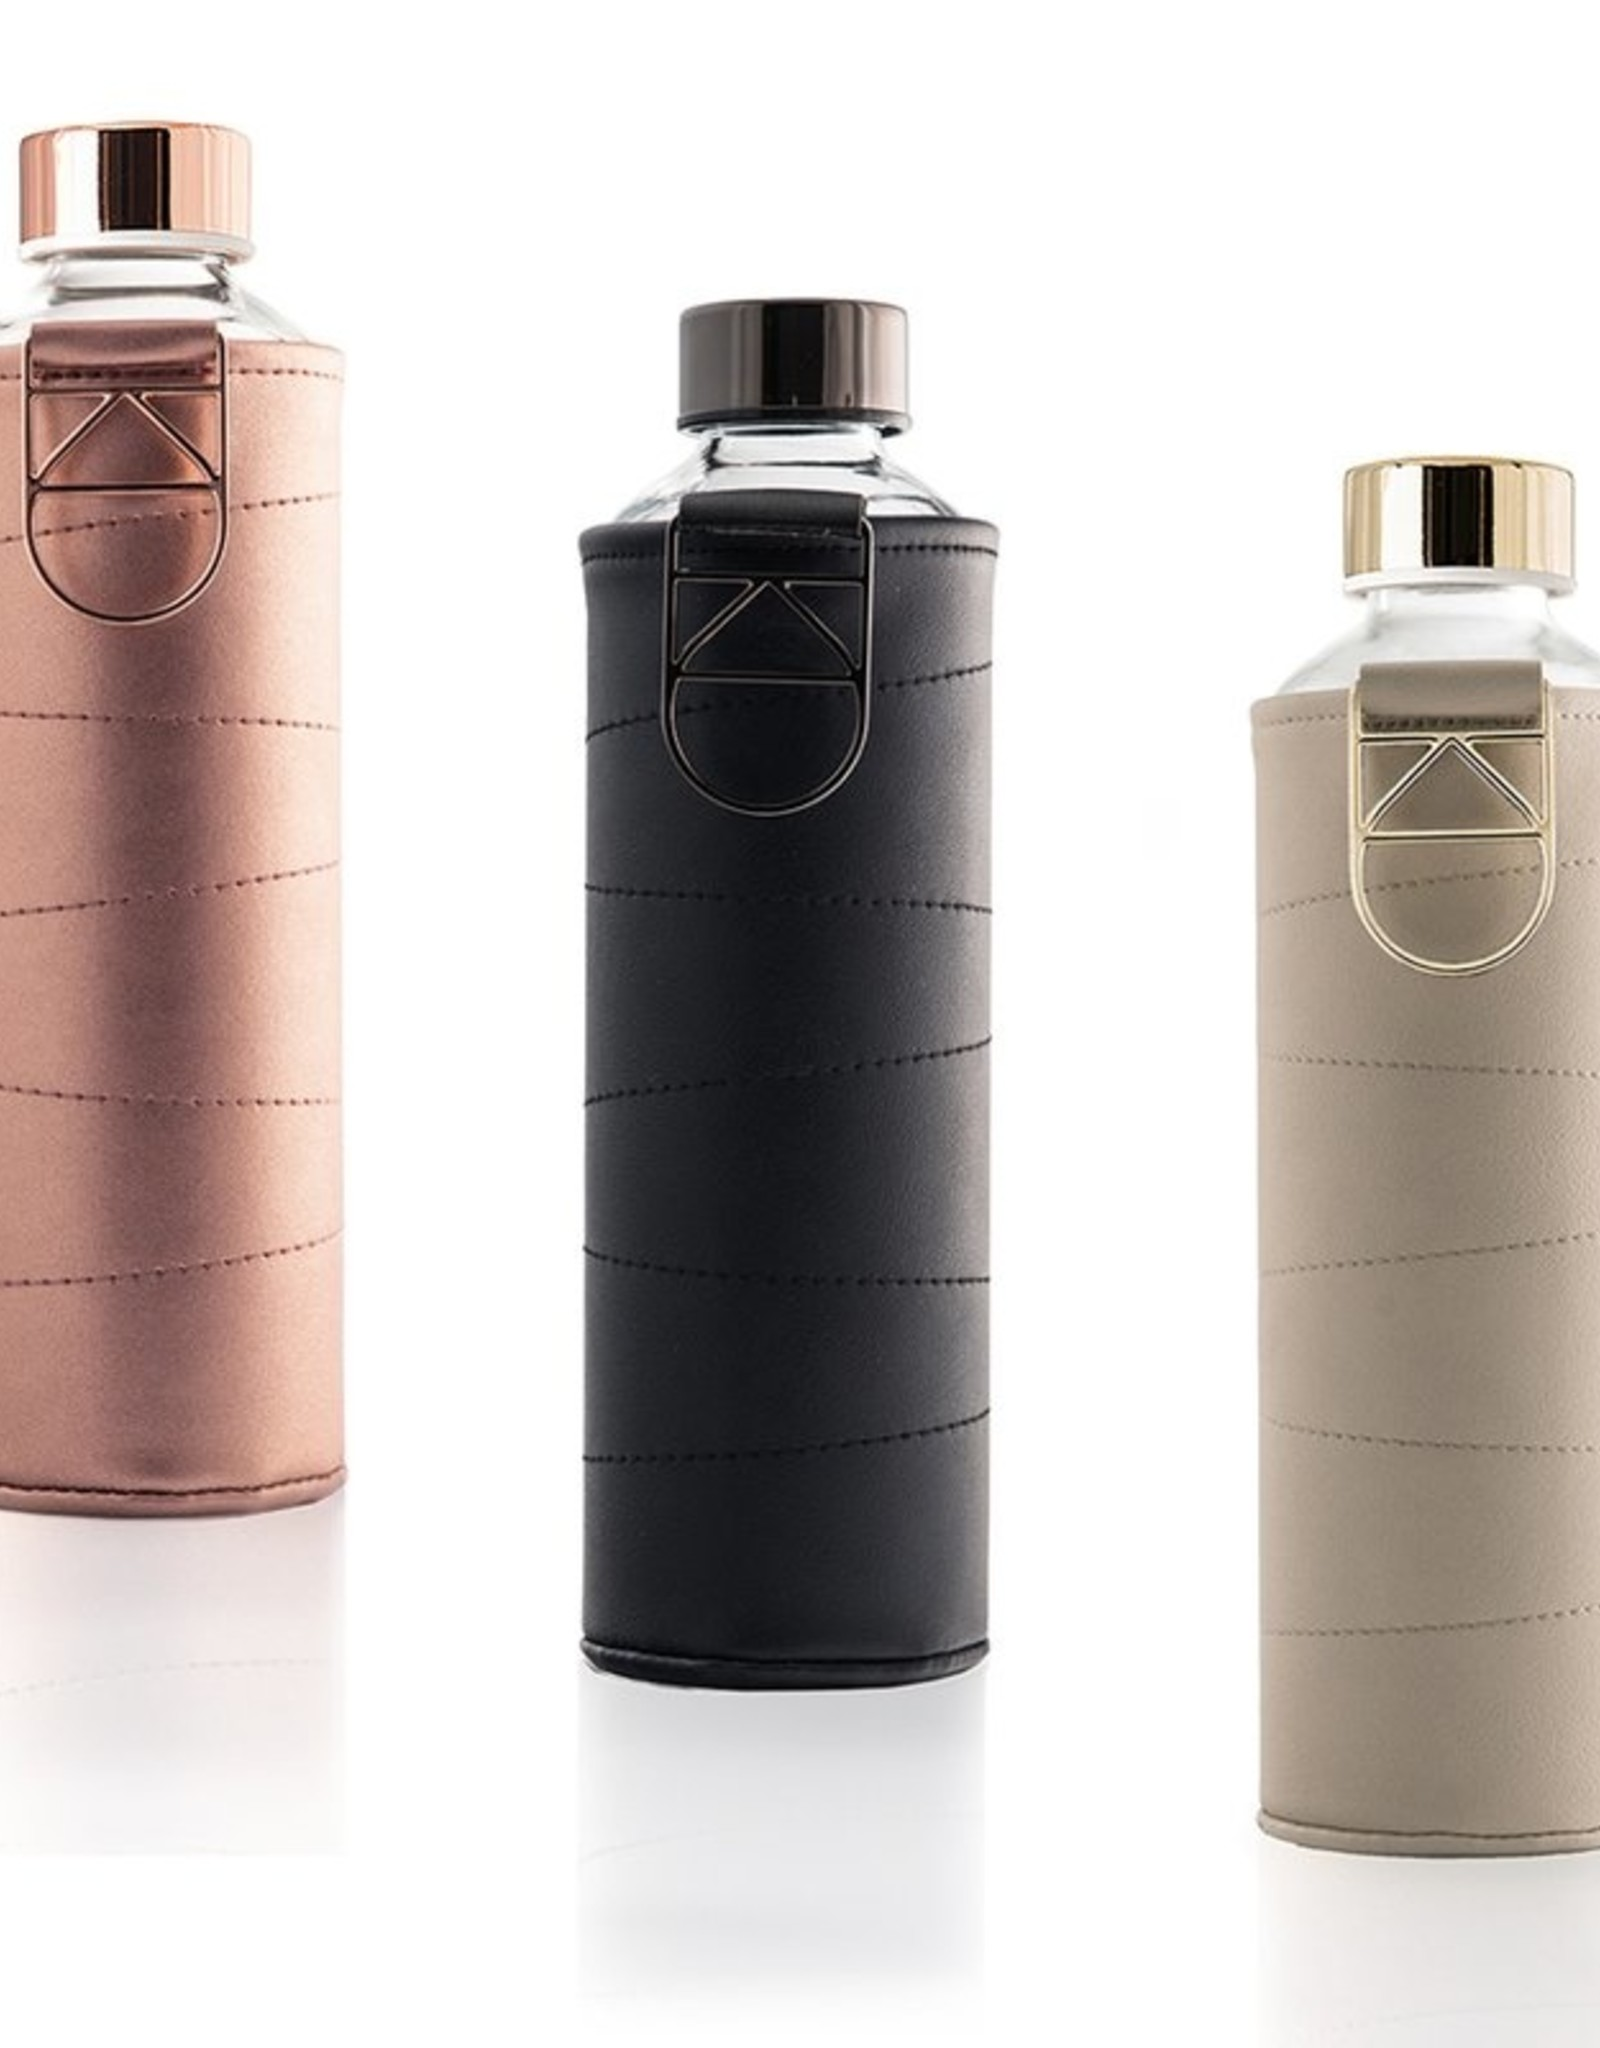 Equa EXTRA nepleren covers Equa mismatch glass bottle 750 ml